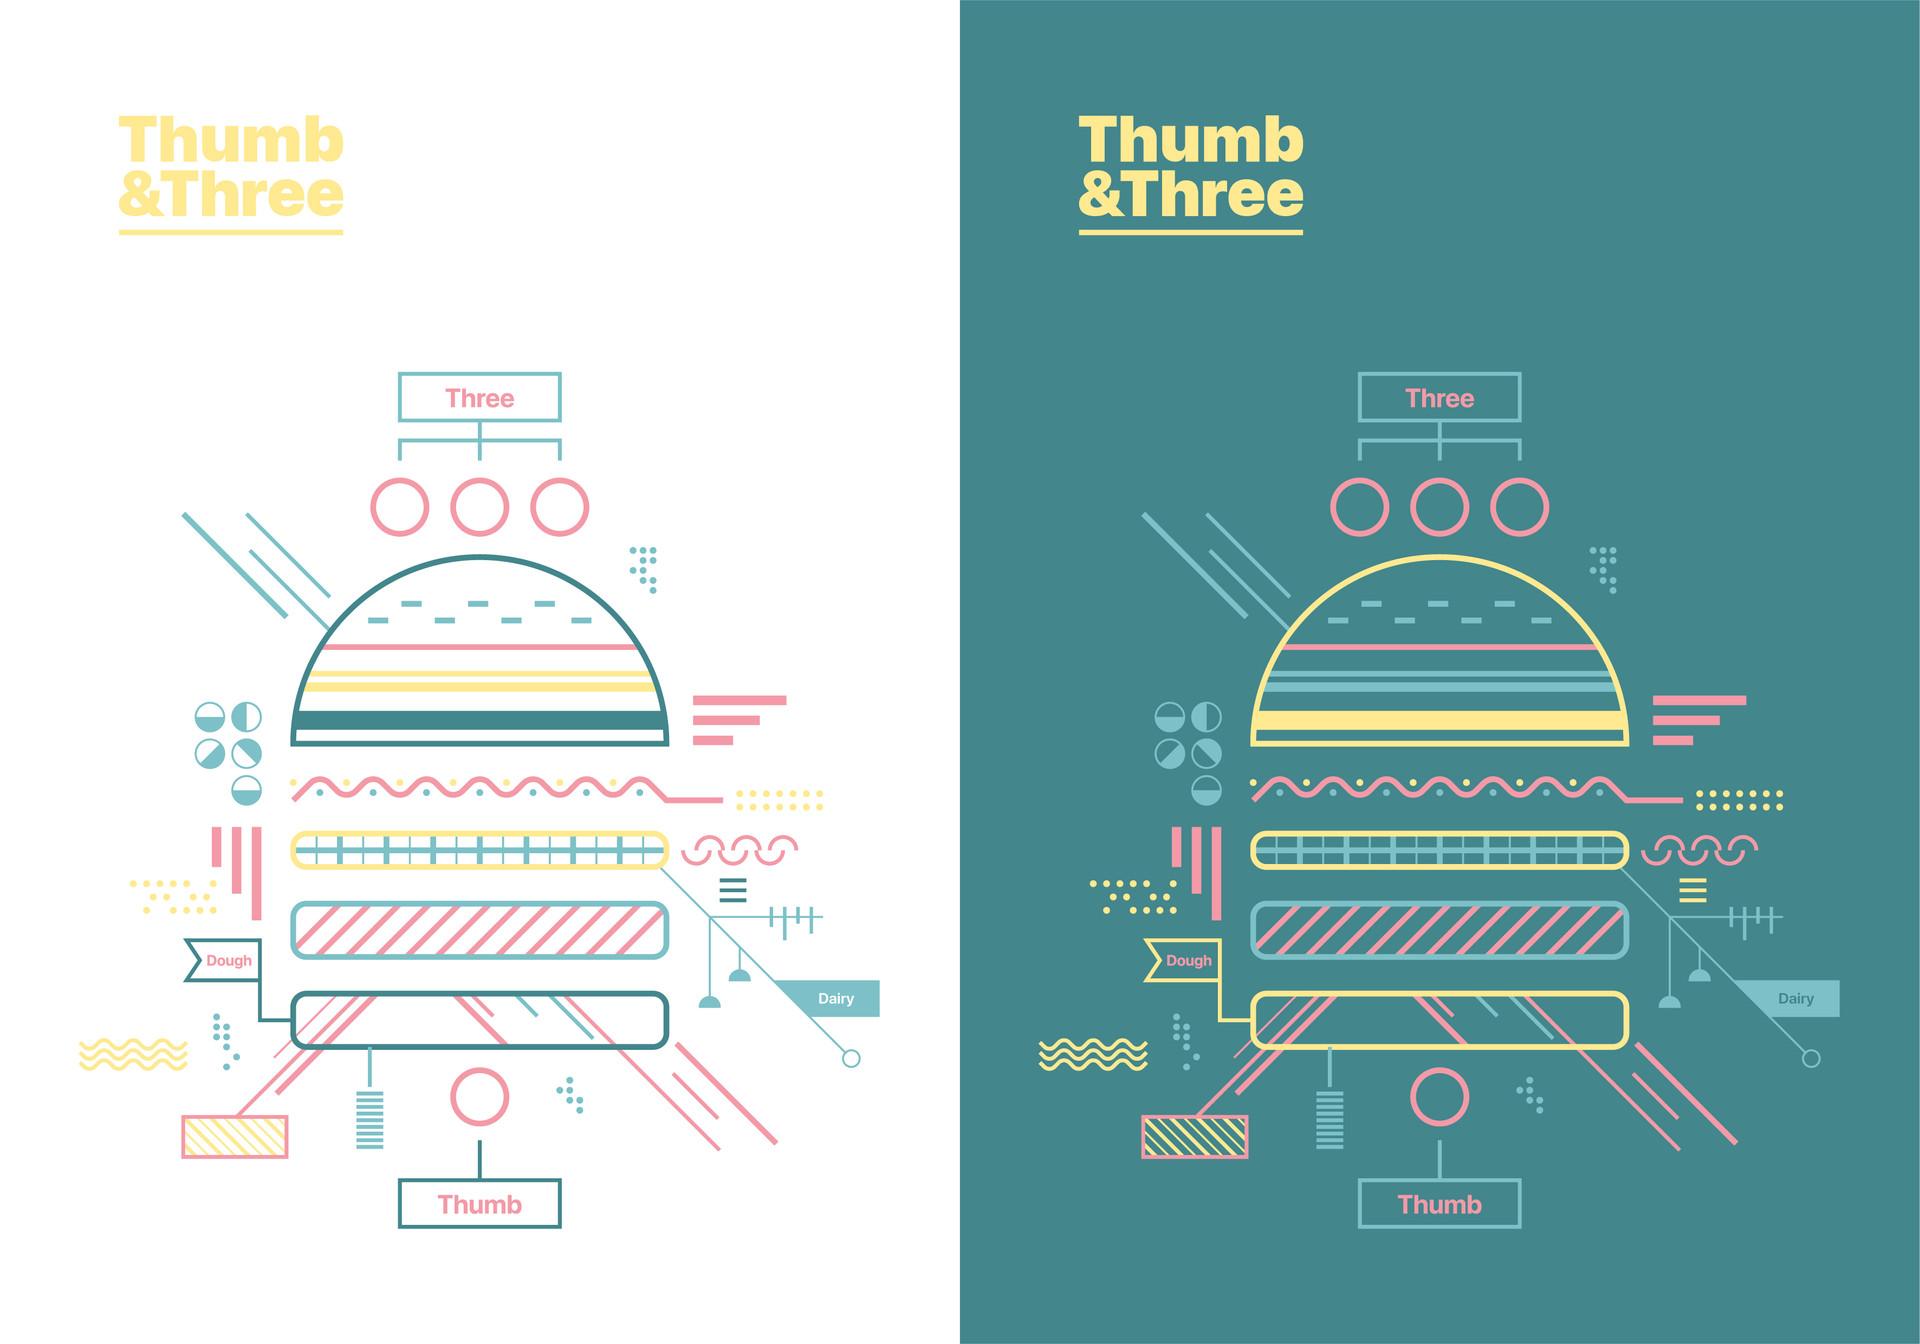 Three&Thumb-04.jpg